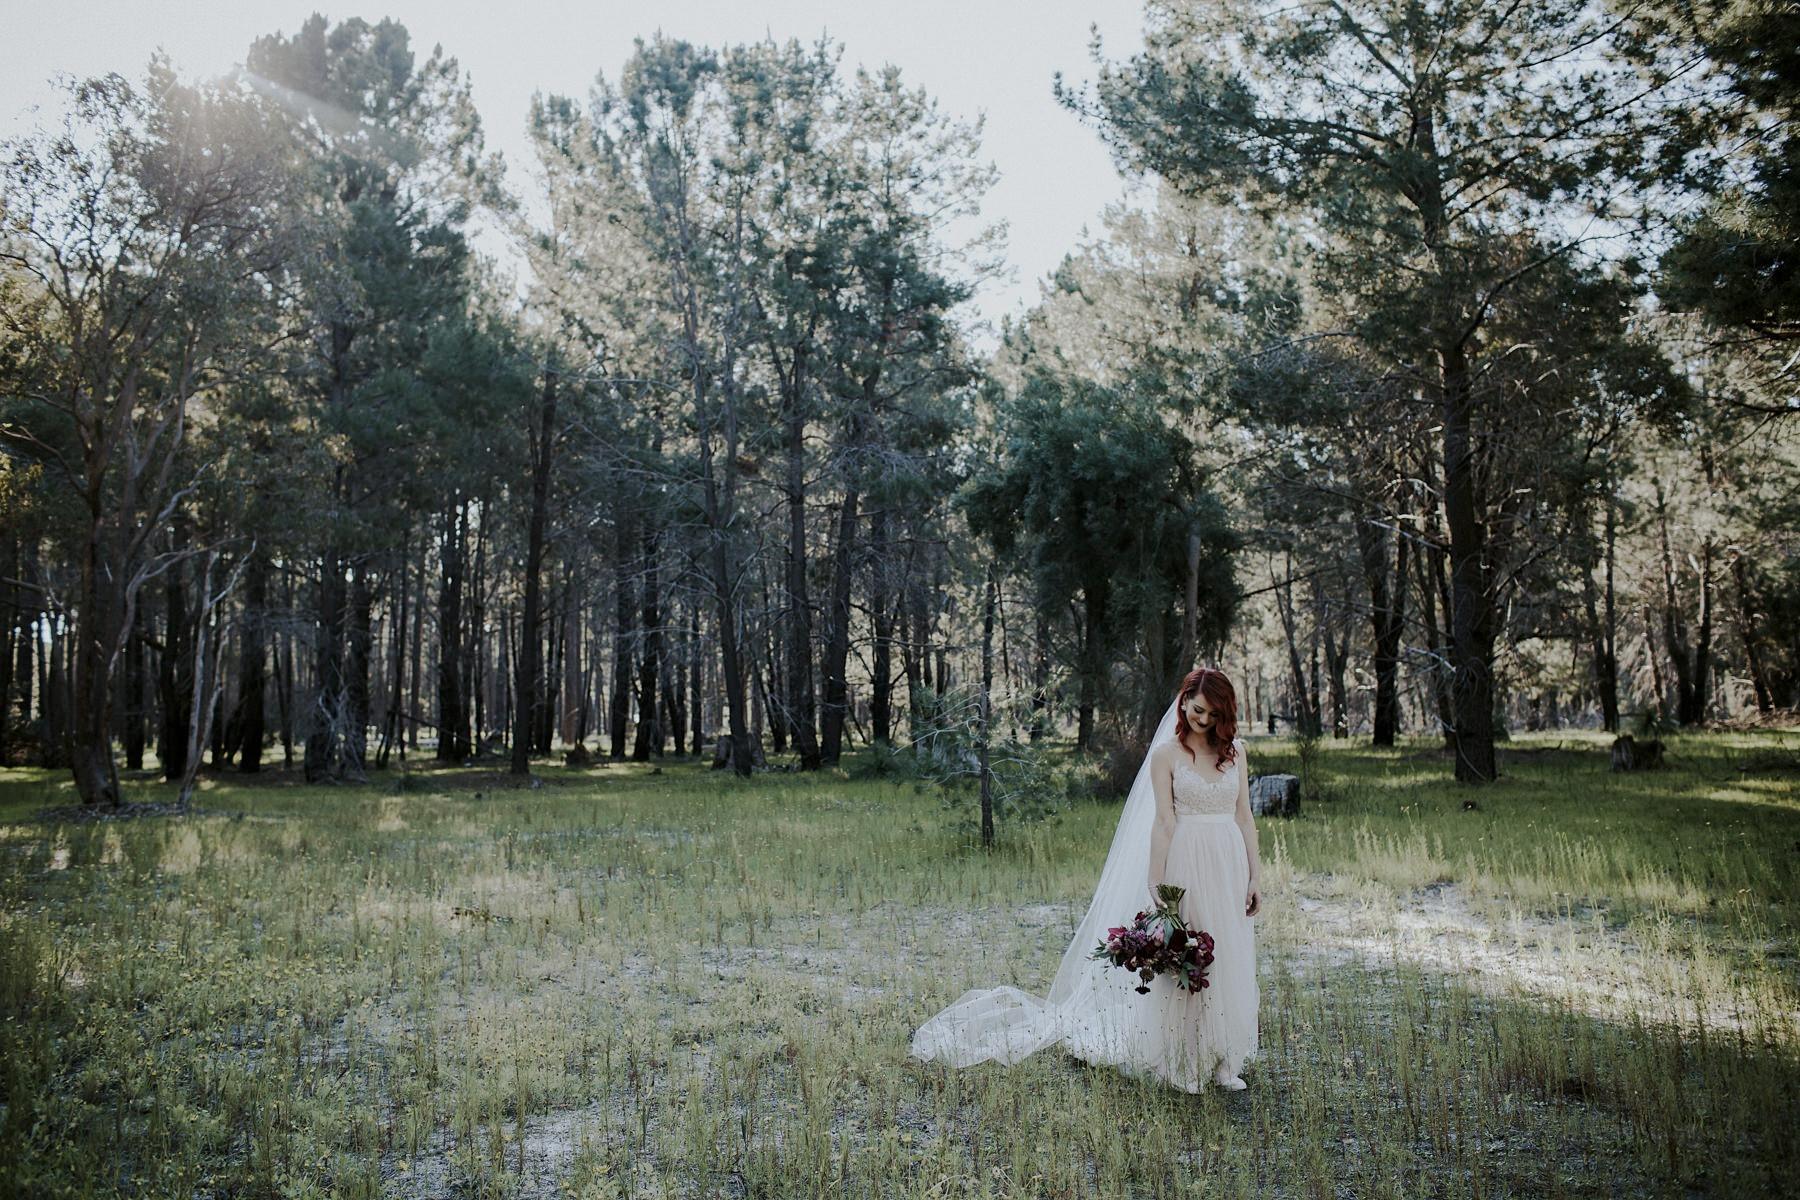 flour-factory-wedding_perth-city-wedding-114